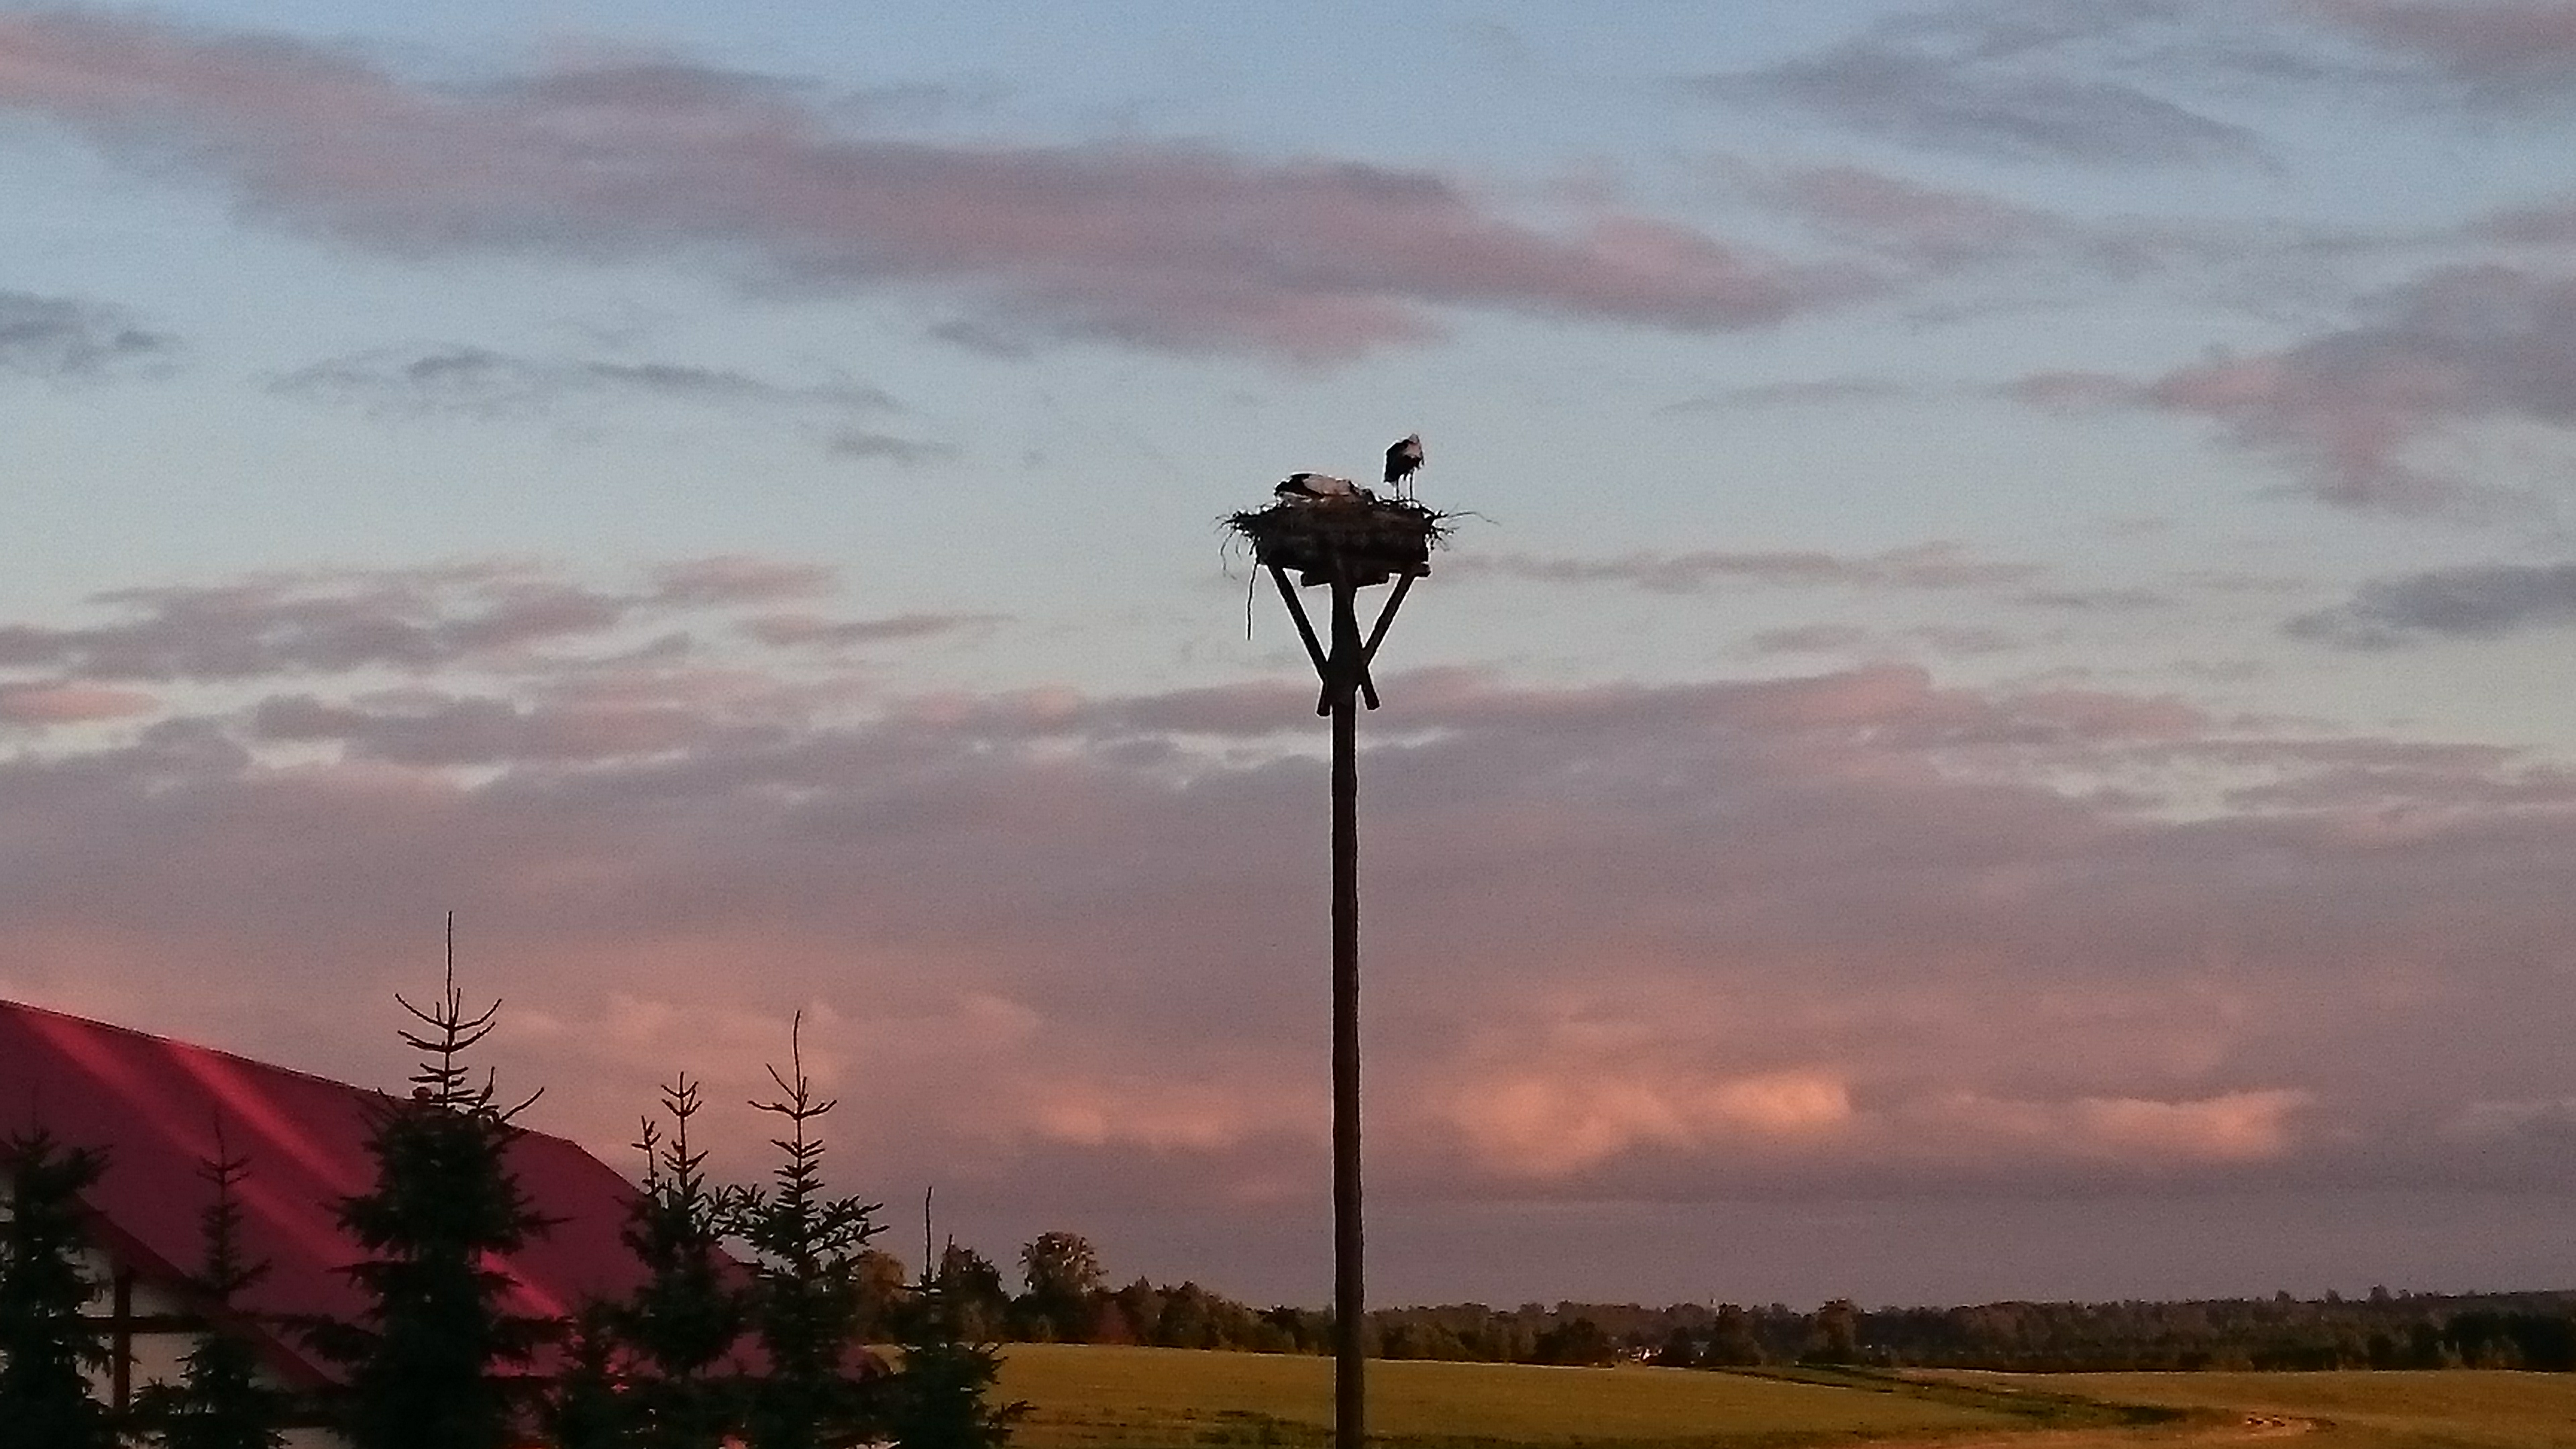 150805 Pocaltawo Stork